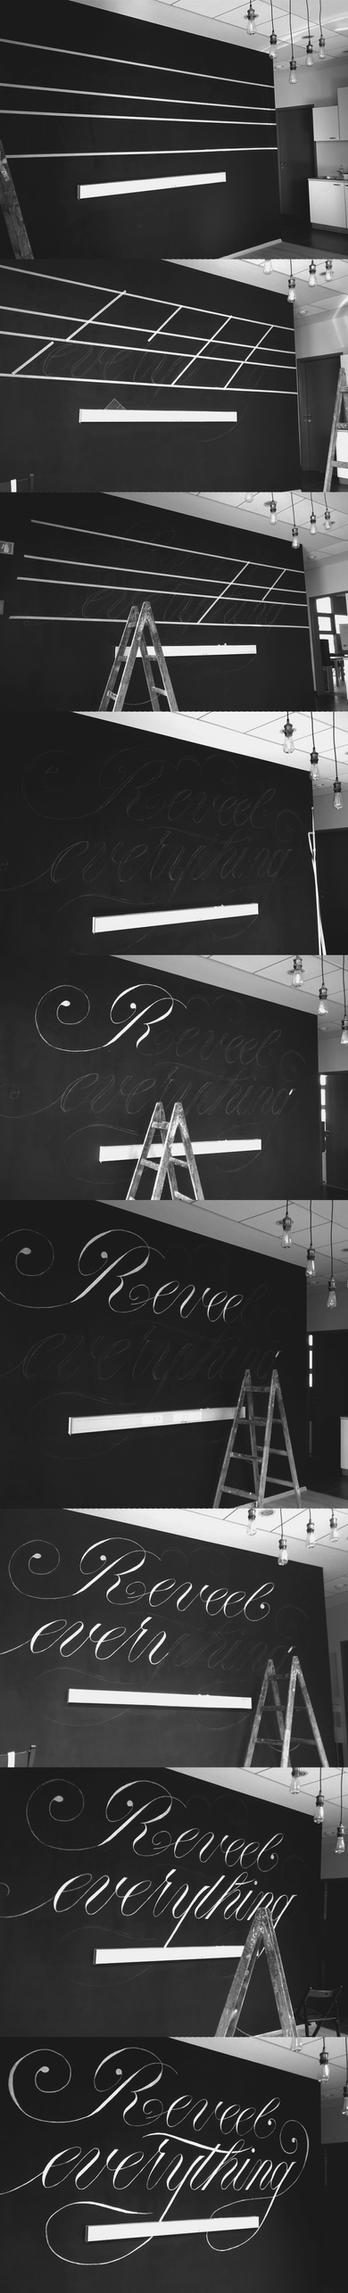 Reveel Mural Lettering WIP by WhiteSylver